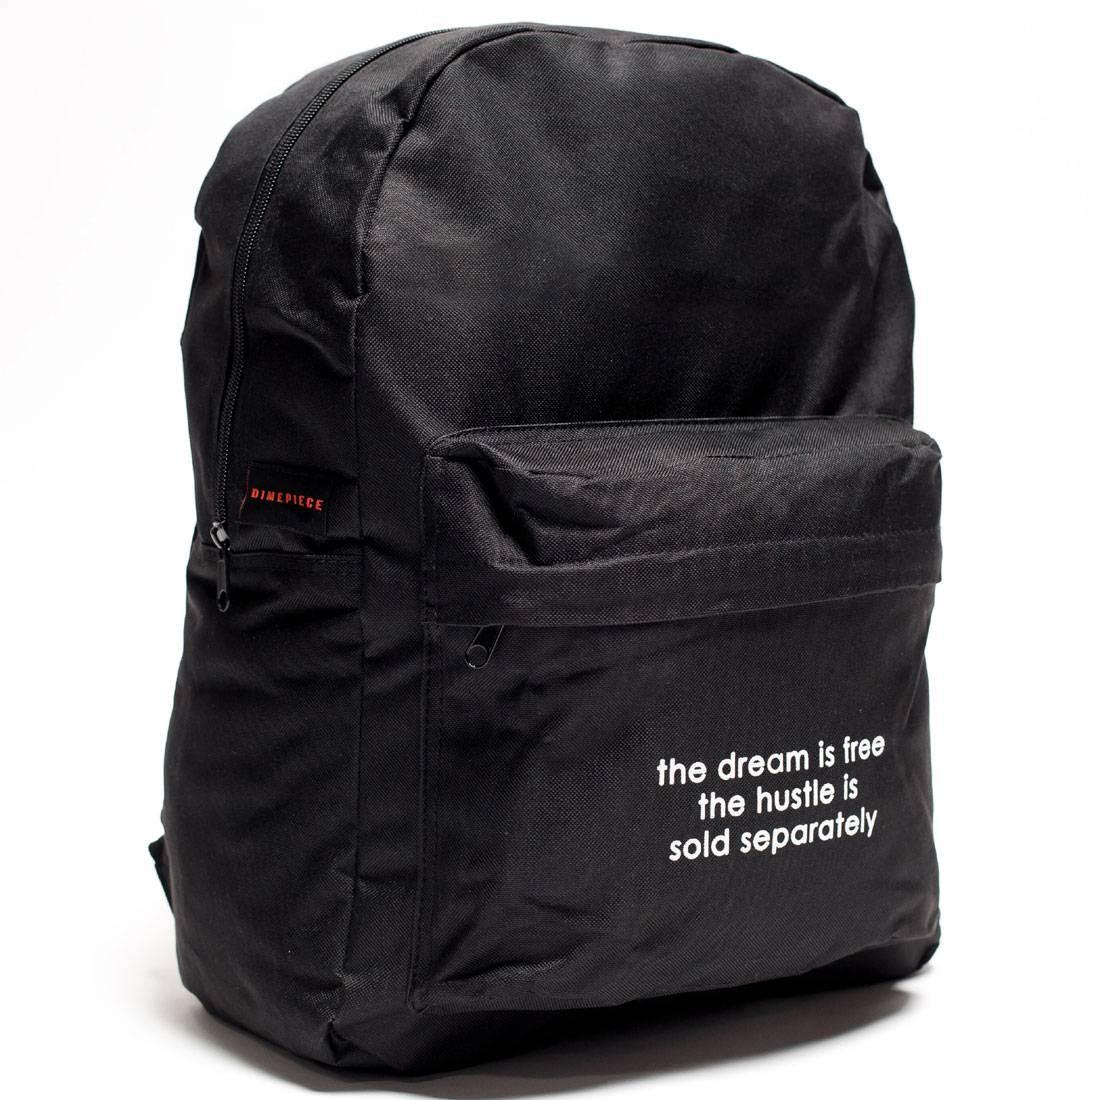 Dimepiece Hustle Is Not Free Backpack (black)